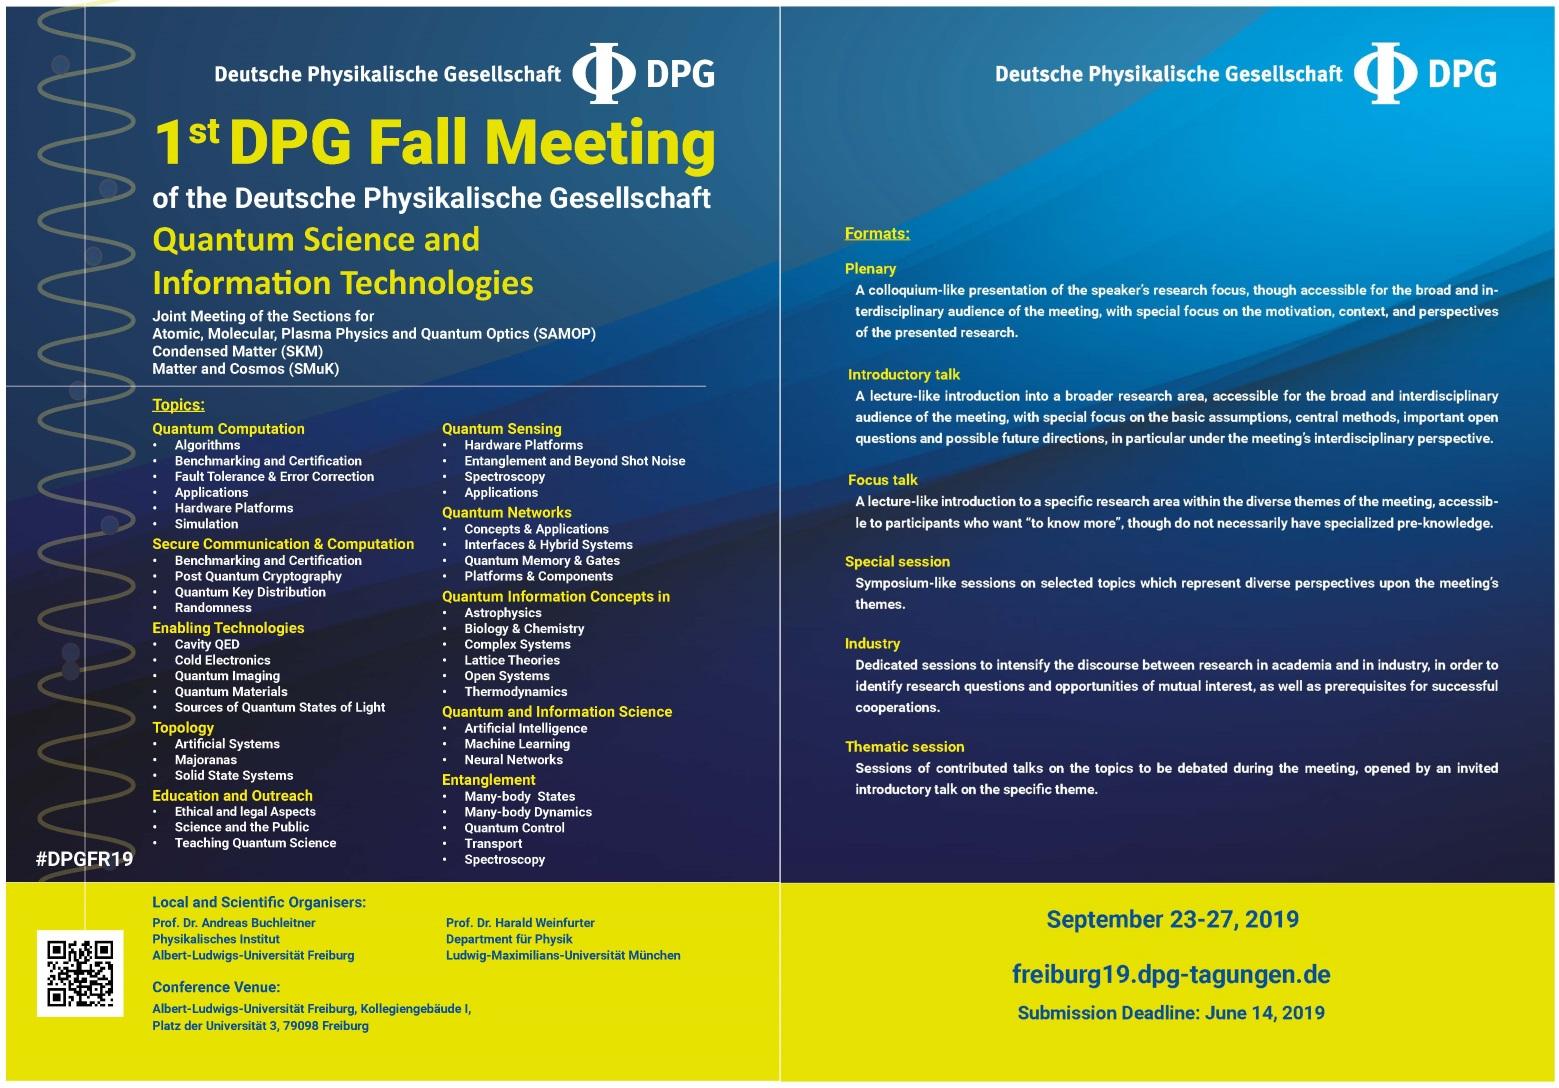 DPG_Fall_Meeting_Announcement_kleiner.jpg